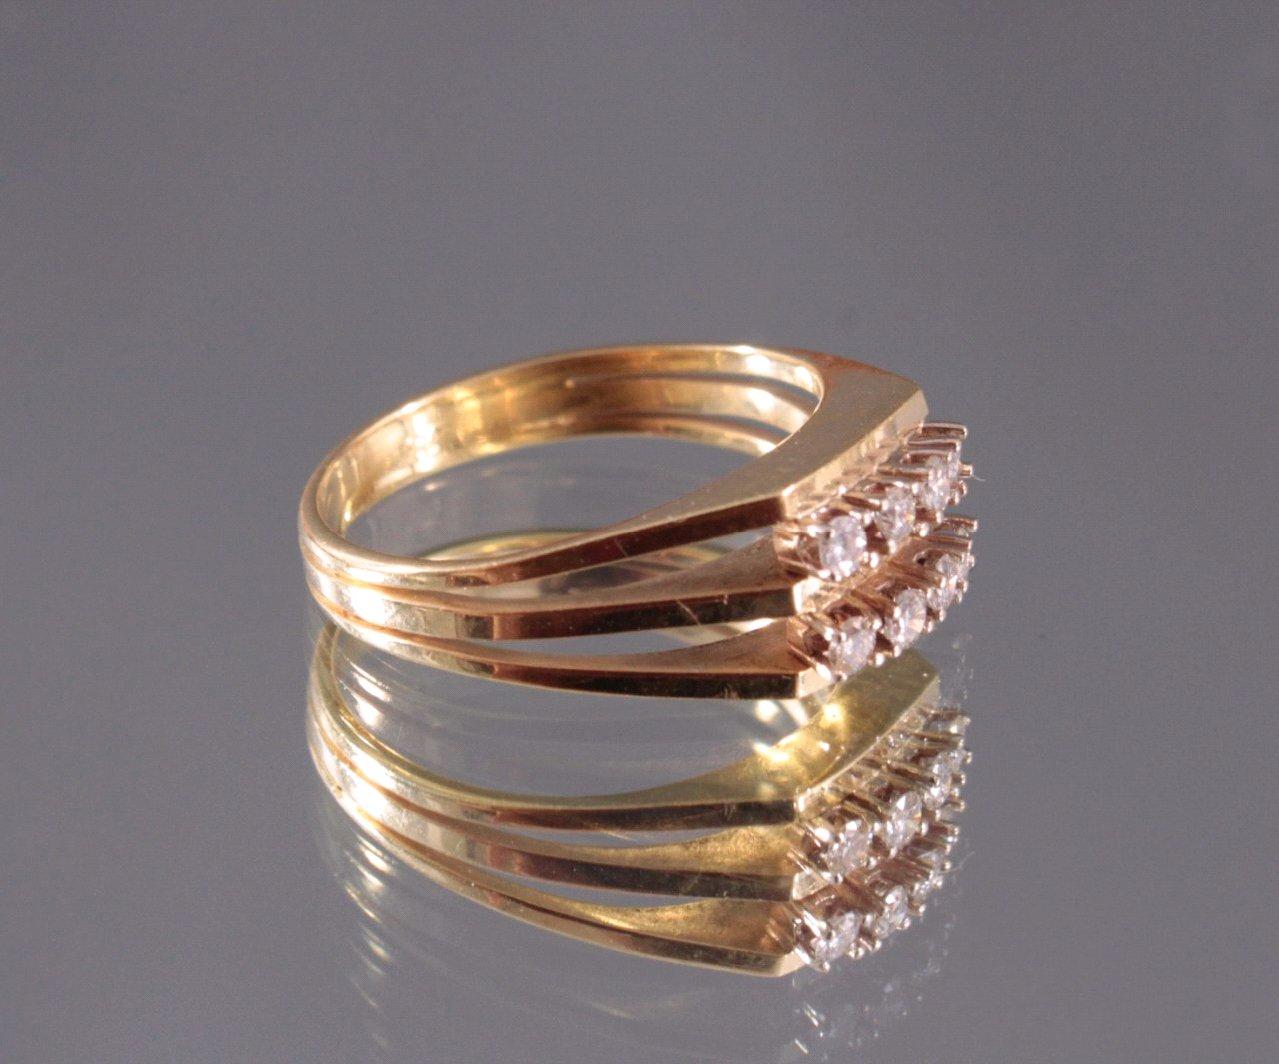 Damenring mit 6 Diamanten, 585/000 Gelb Gold-1